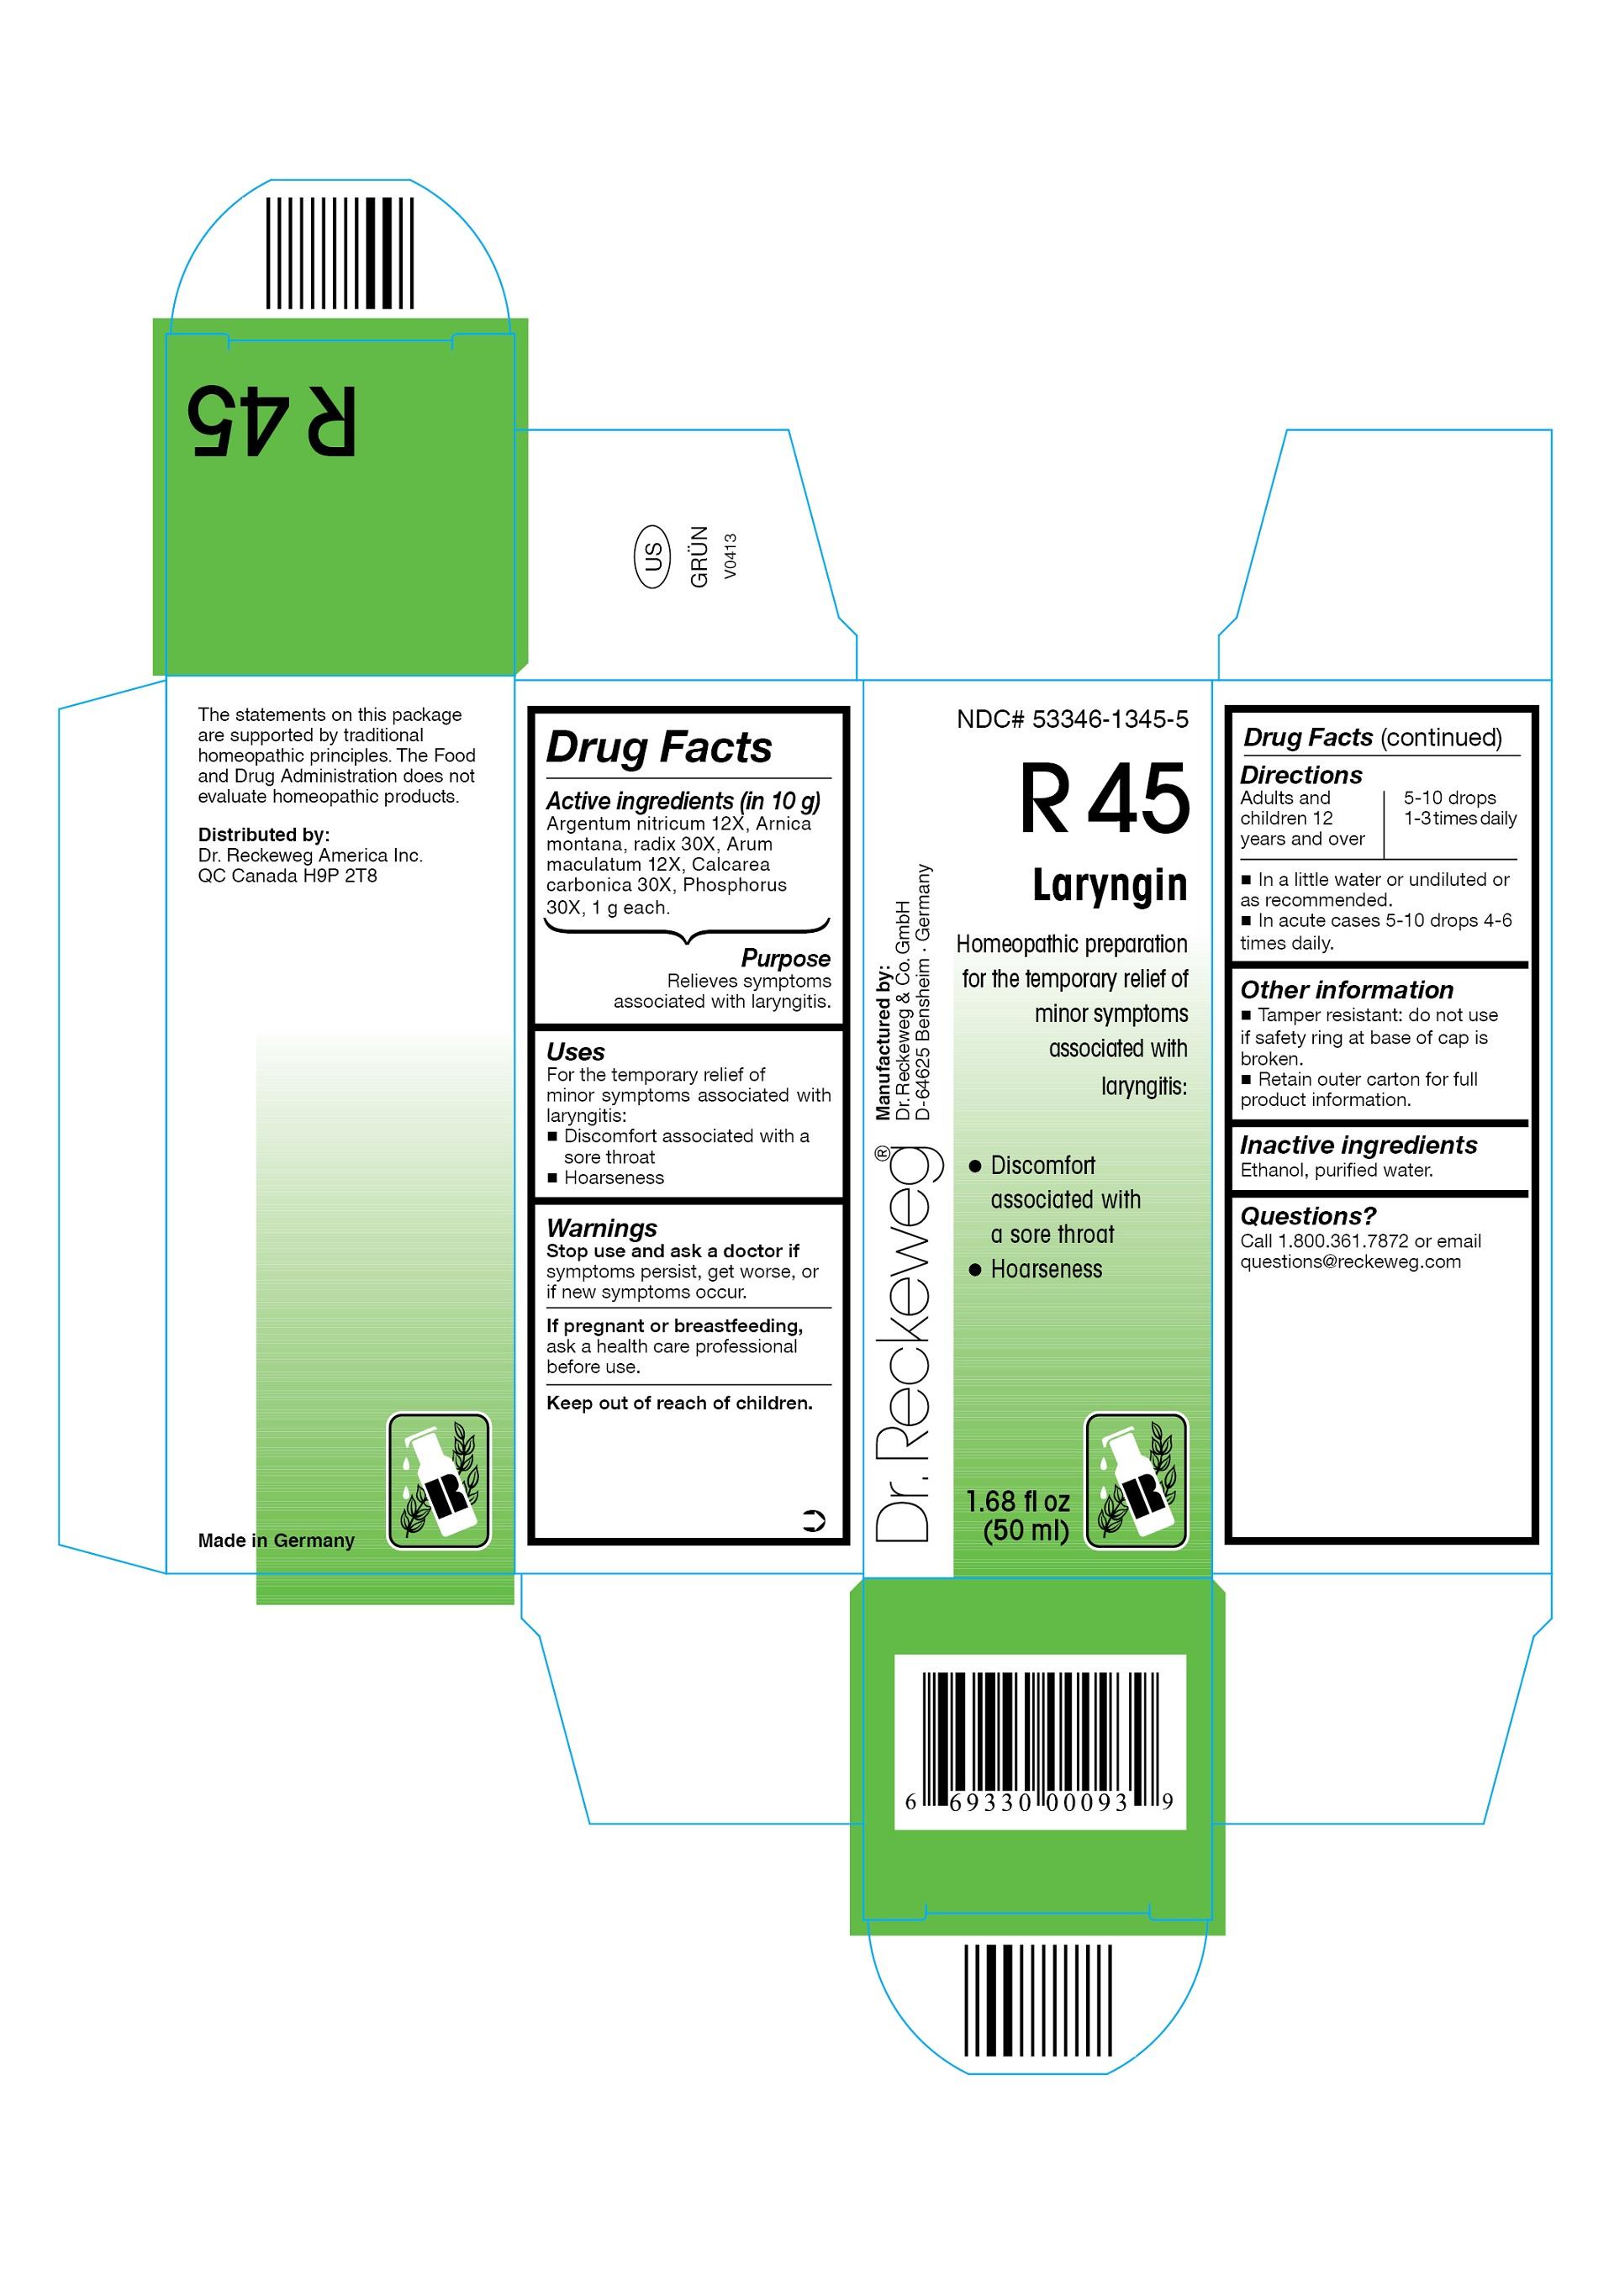 Dr. Reckeweg R45 Laryngin Combination Product (Argentum Nitricum 12x, Arnica Montana, Radix 30x, Arum Maculatum 12x, Calcarea Carbonica 30x, Phosphorus 30x) Liquid [Pharmazeutische Fabrik Dr. Reckeweg & Co]